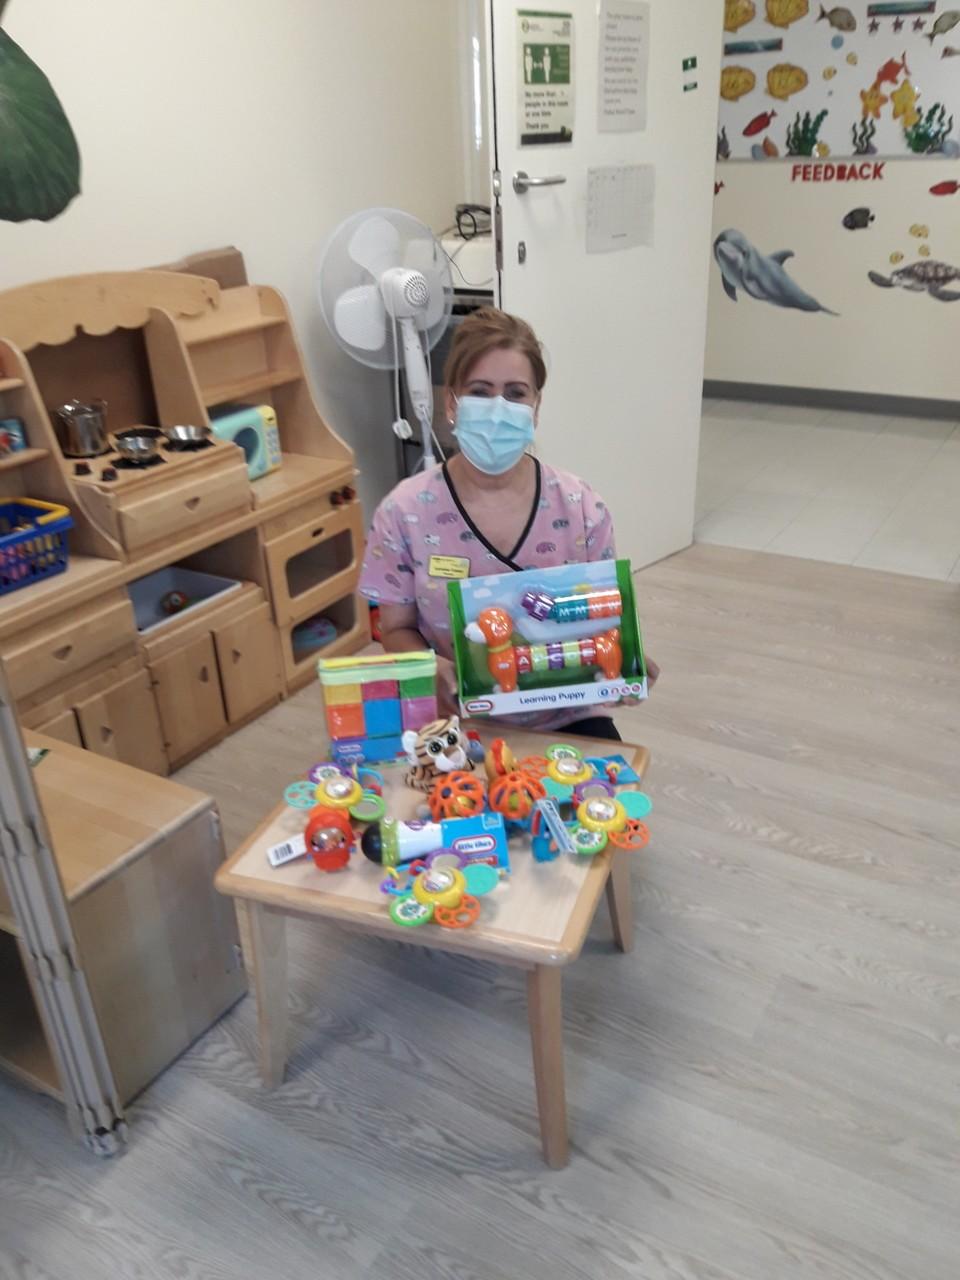 Toys for the children's ward | Asda Ashford